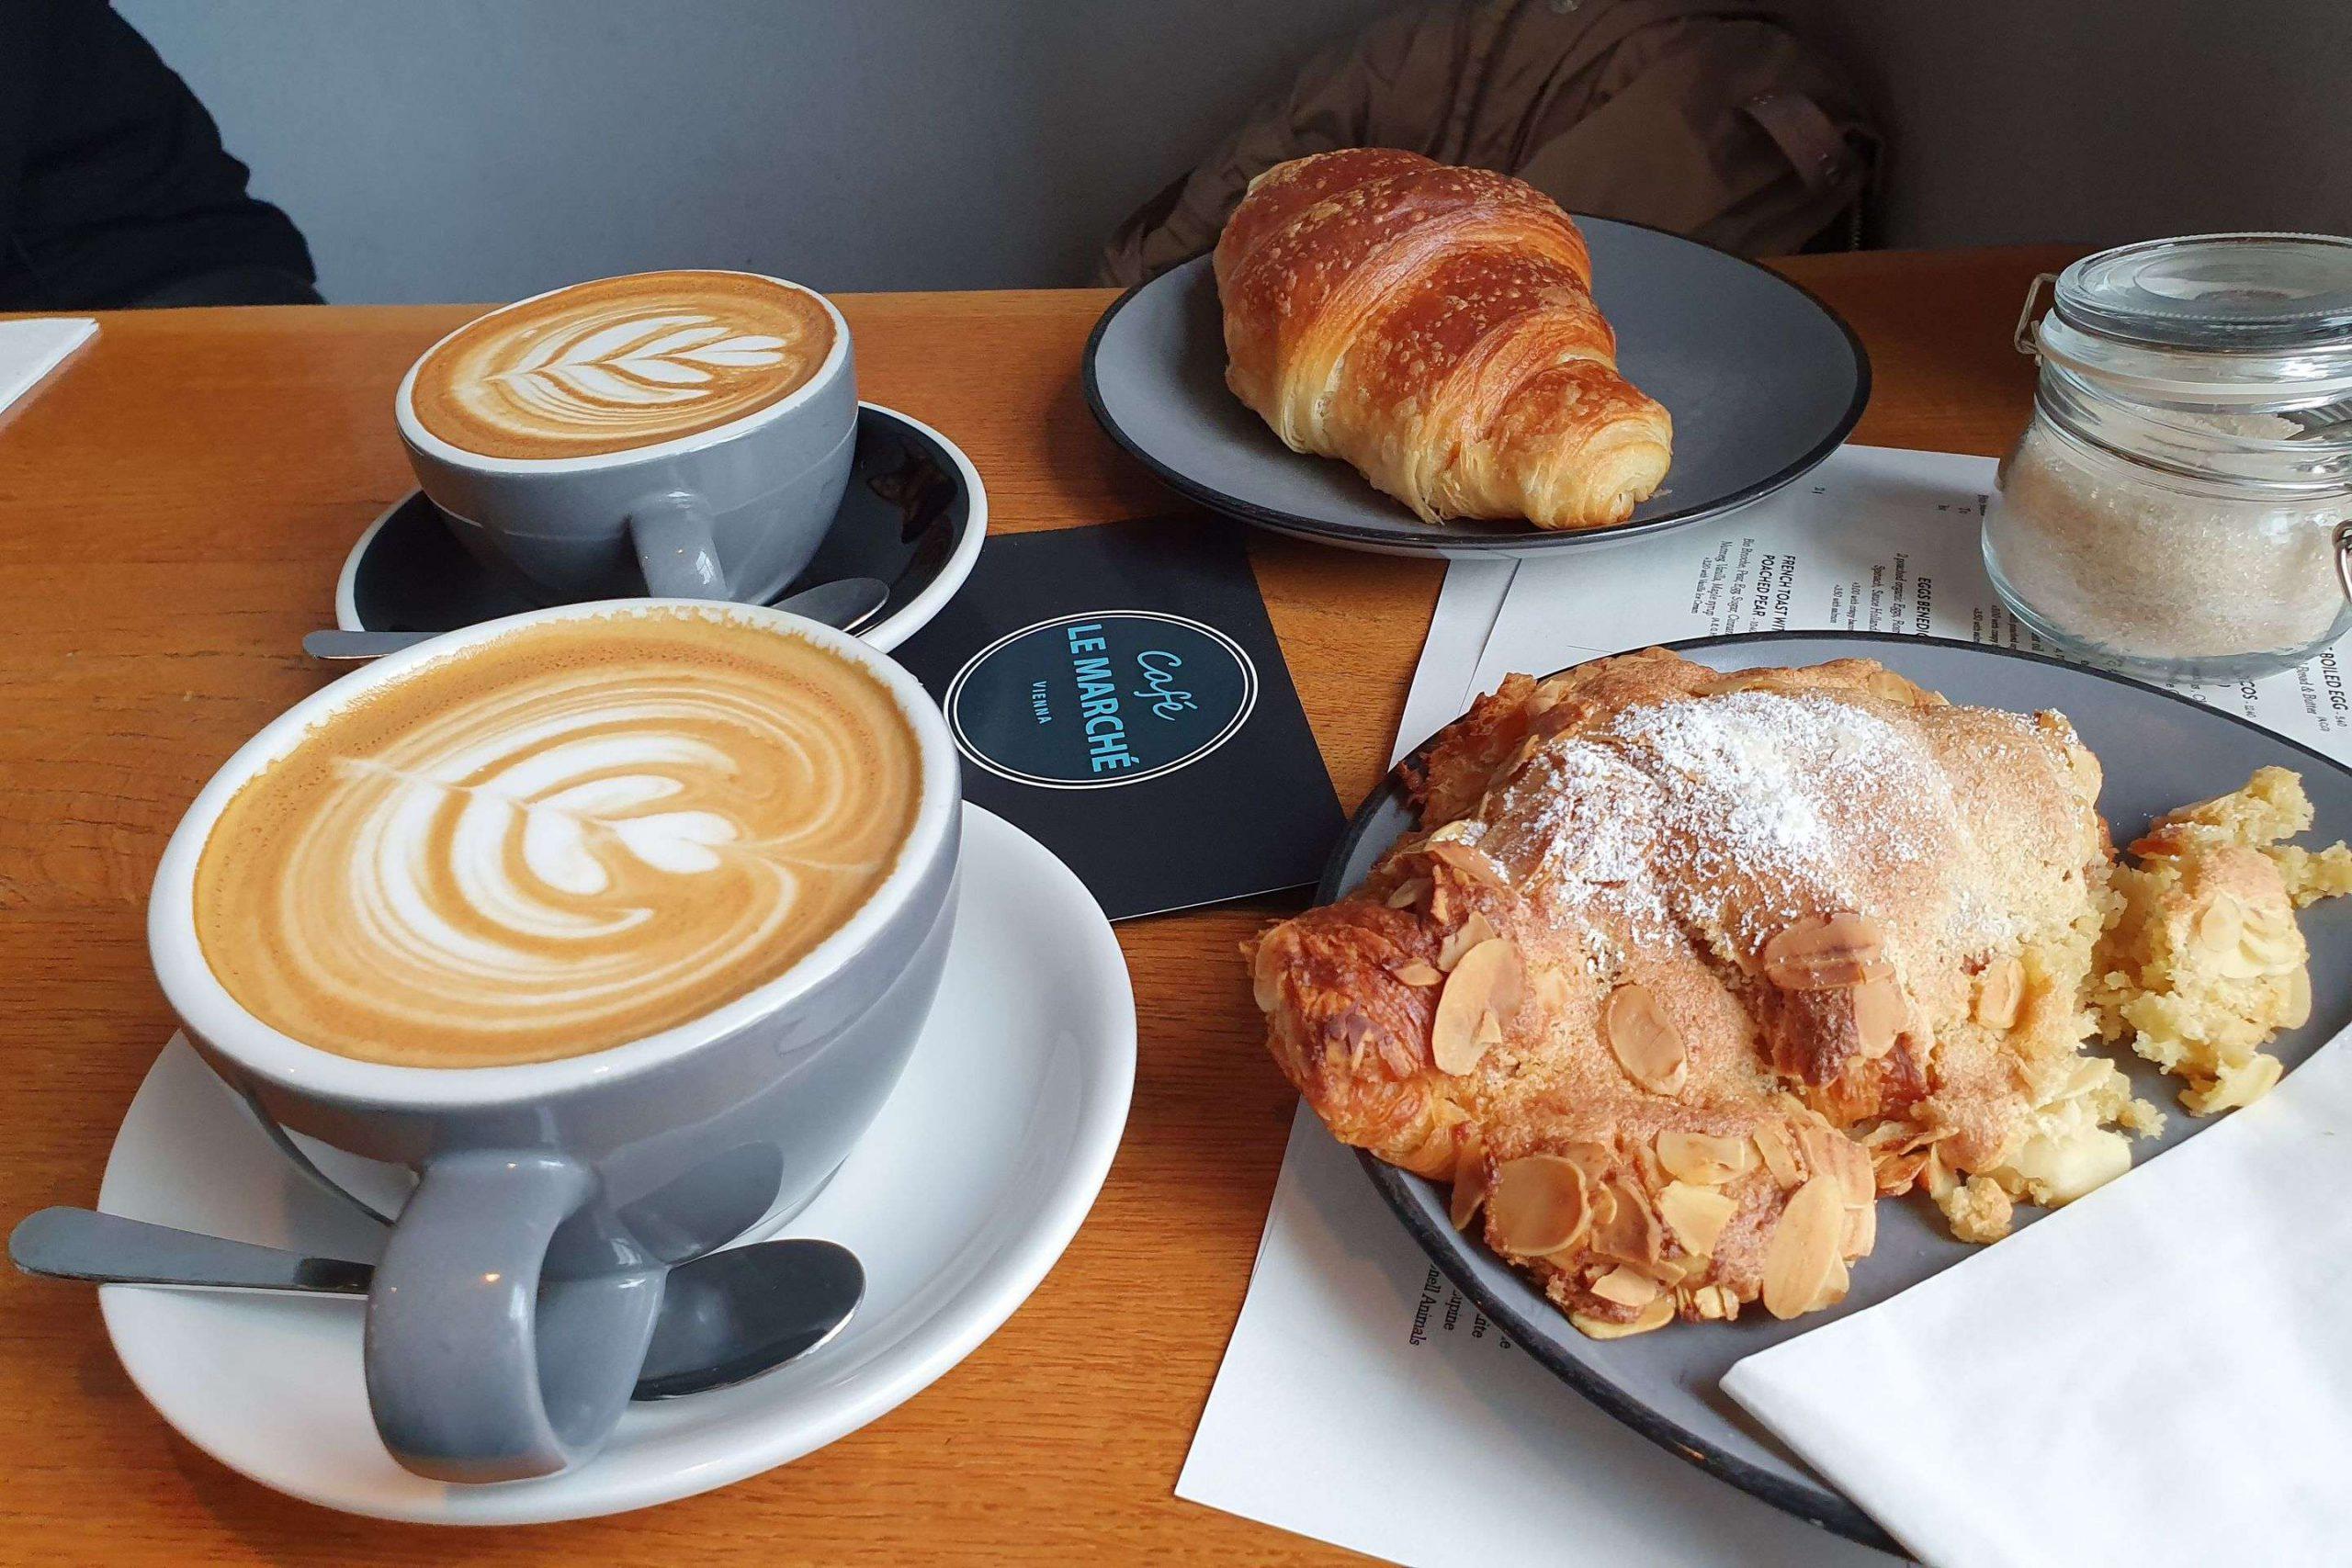 Cappuccino und Mandel Croissant Café le Marche